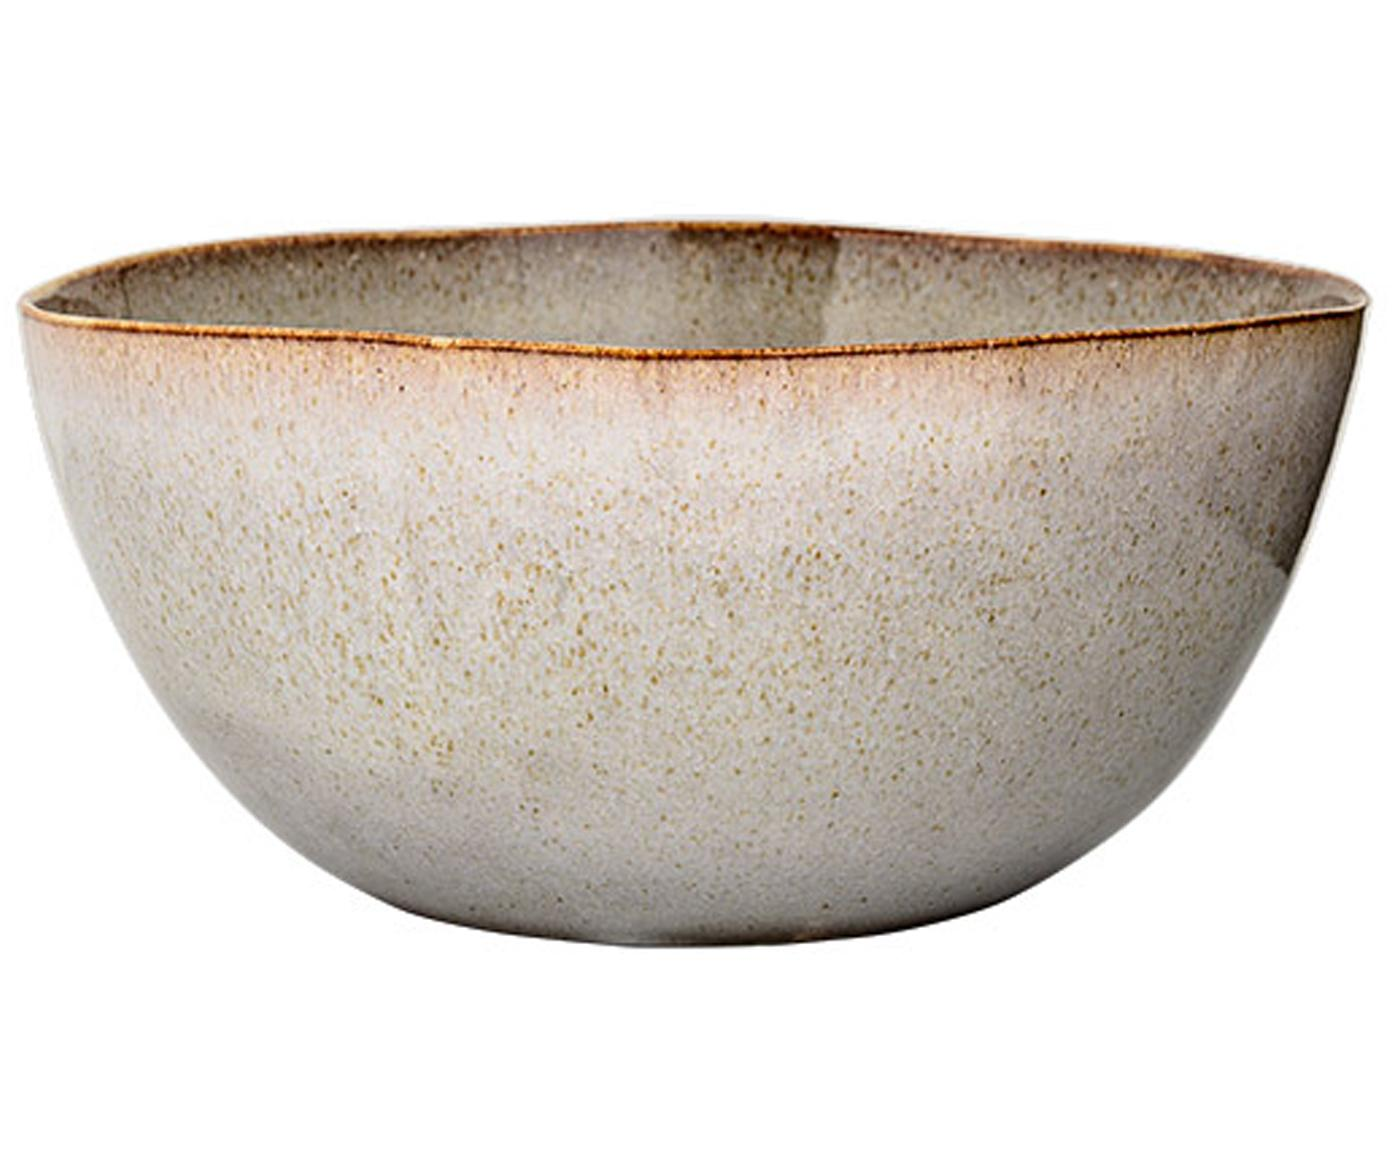 Handgefertigte Schüssel Sandrine, Keramik, Hellgrau, Ø 26 x H 17 cm